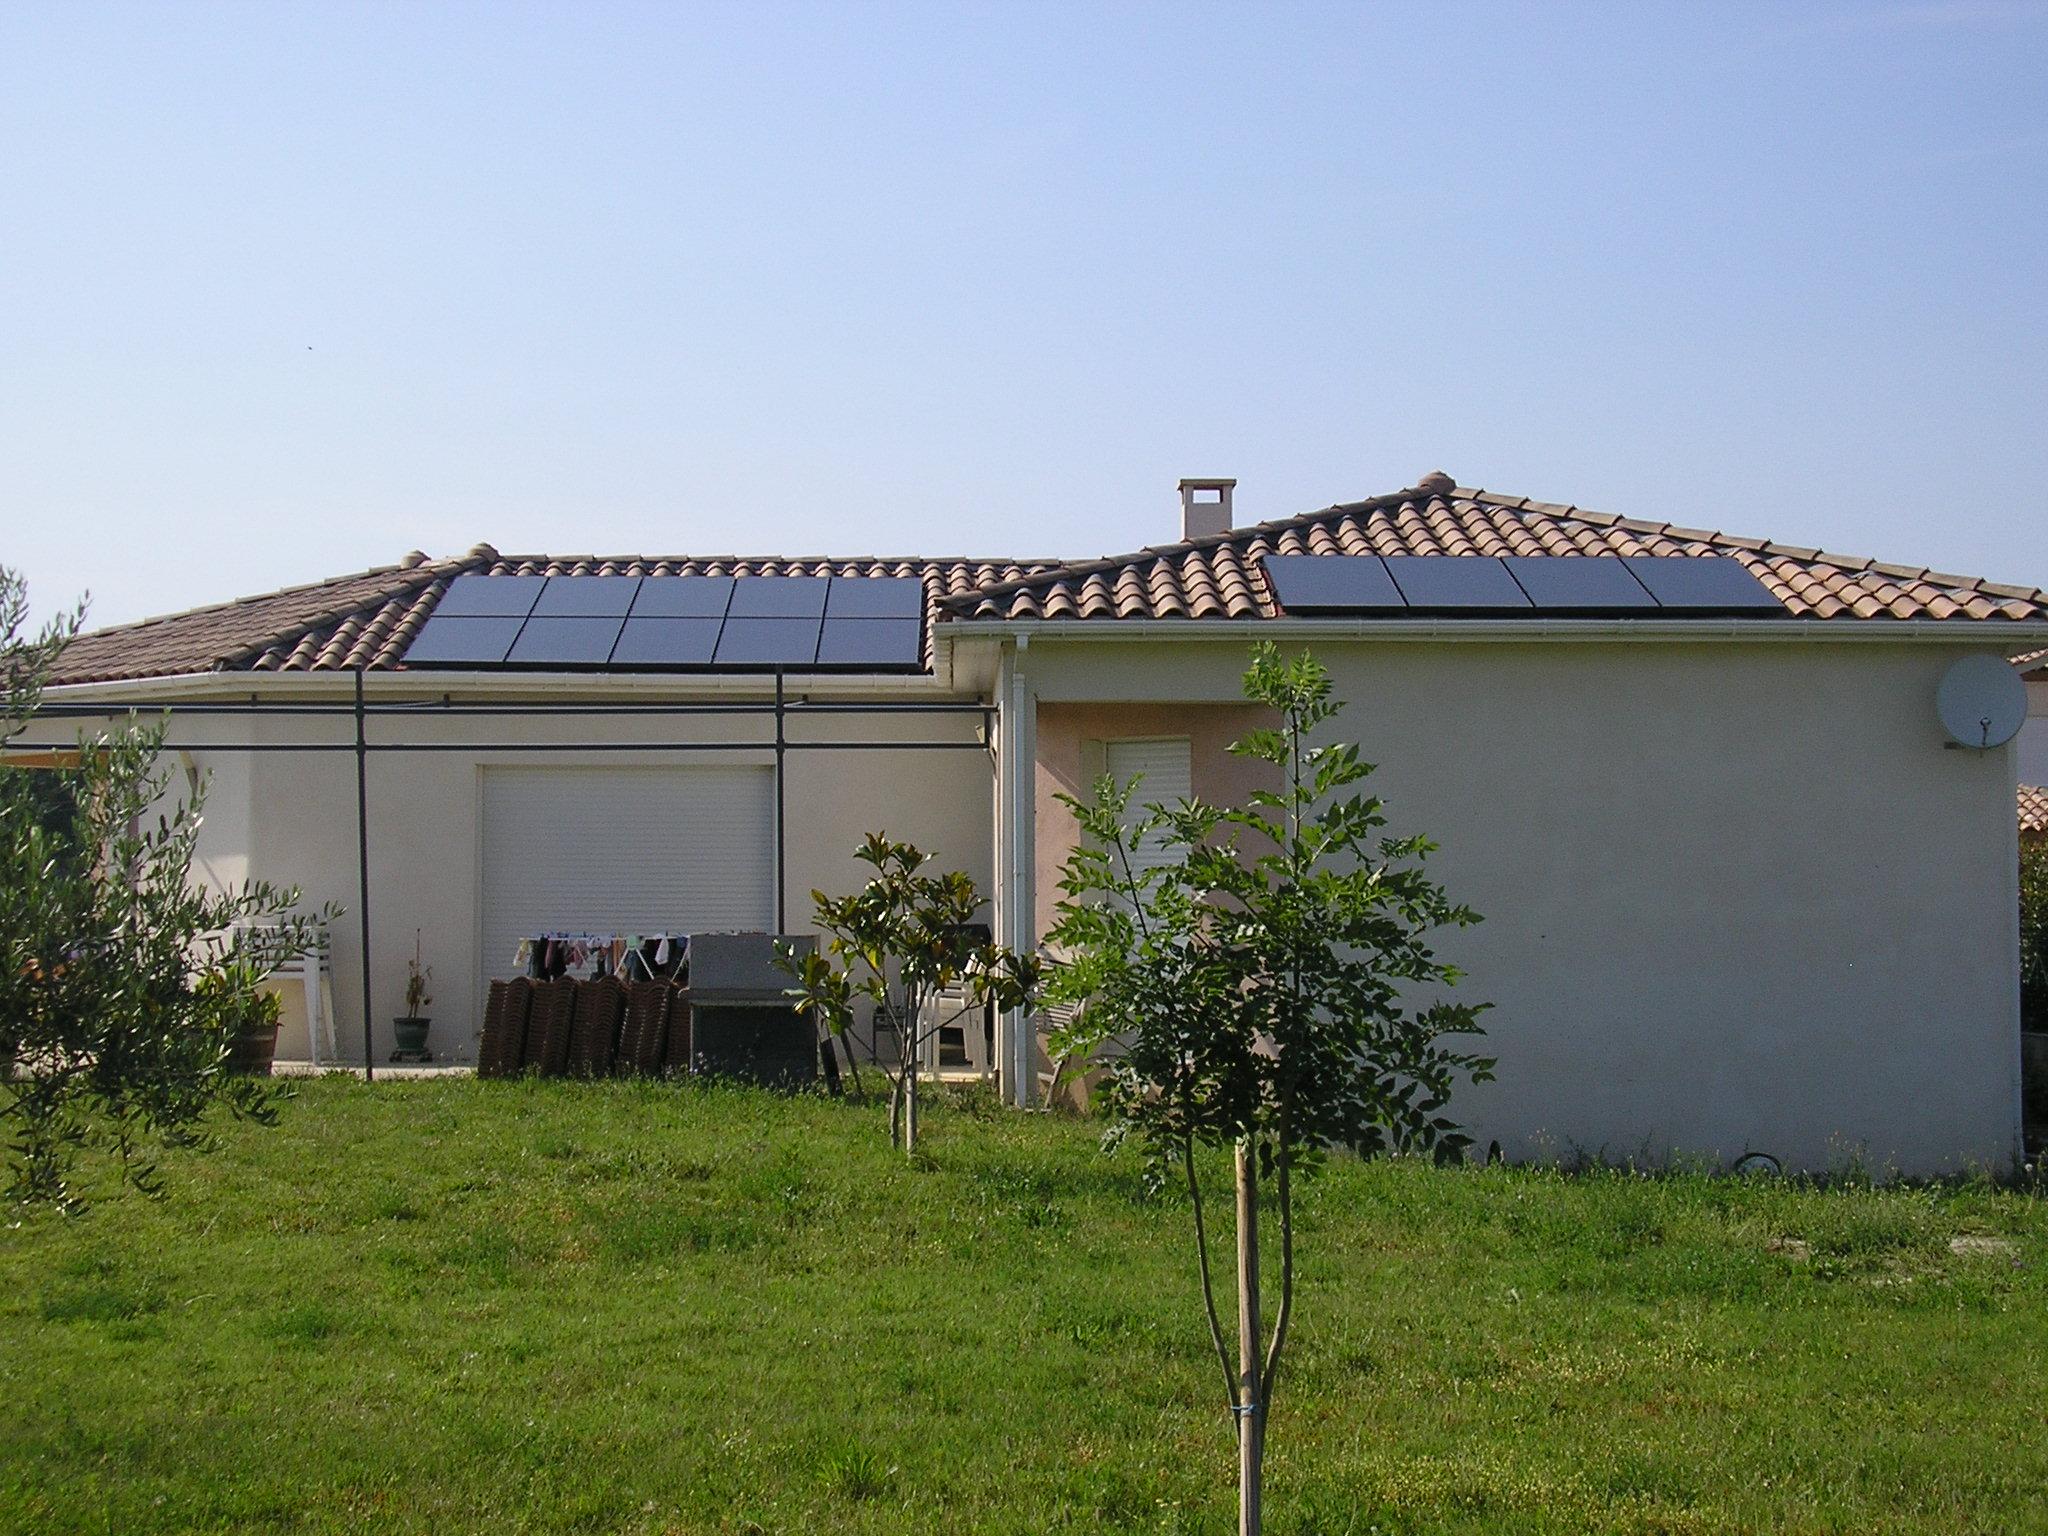 http://images.onlc.eu/natura-energiesNDD//123781925965.jpg